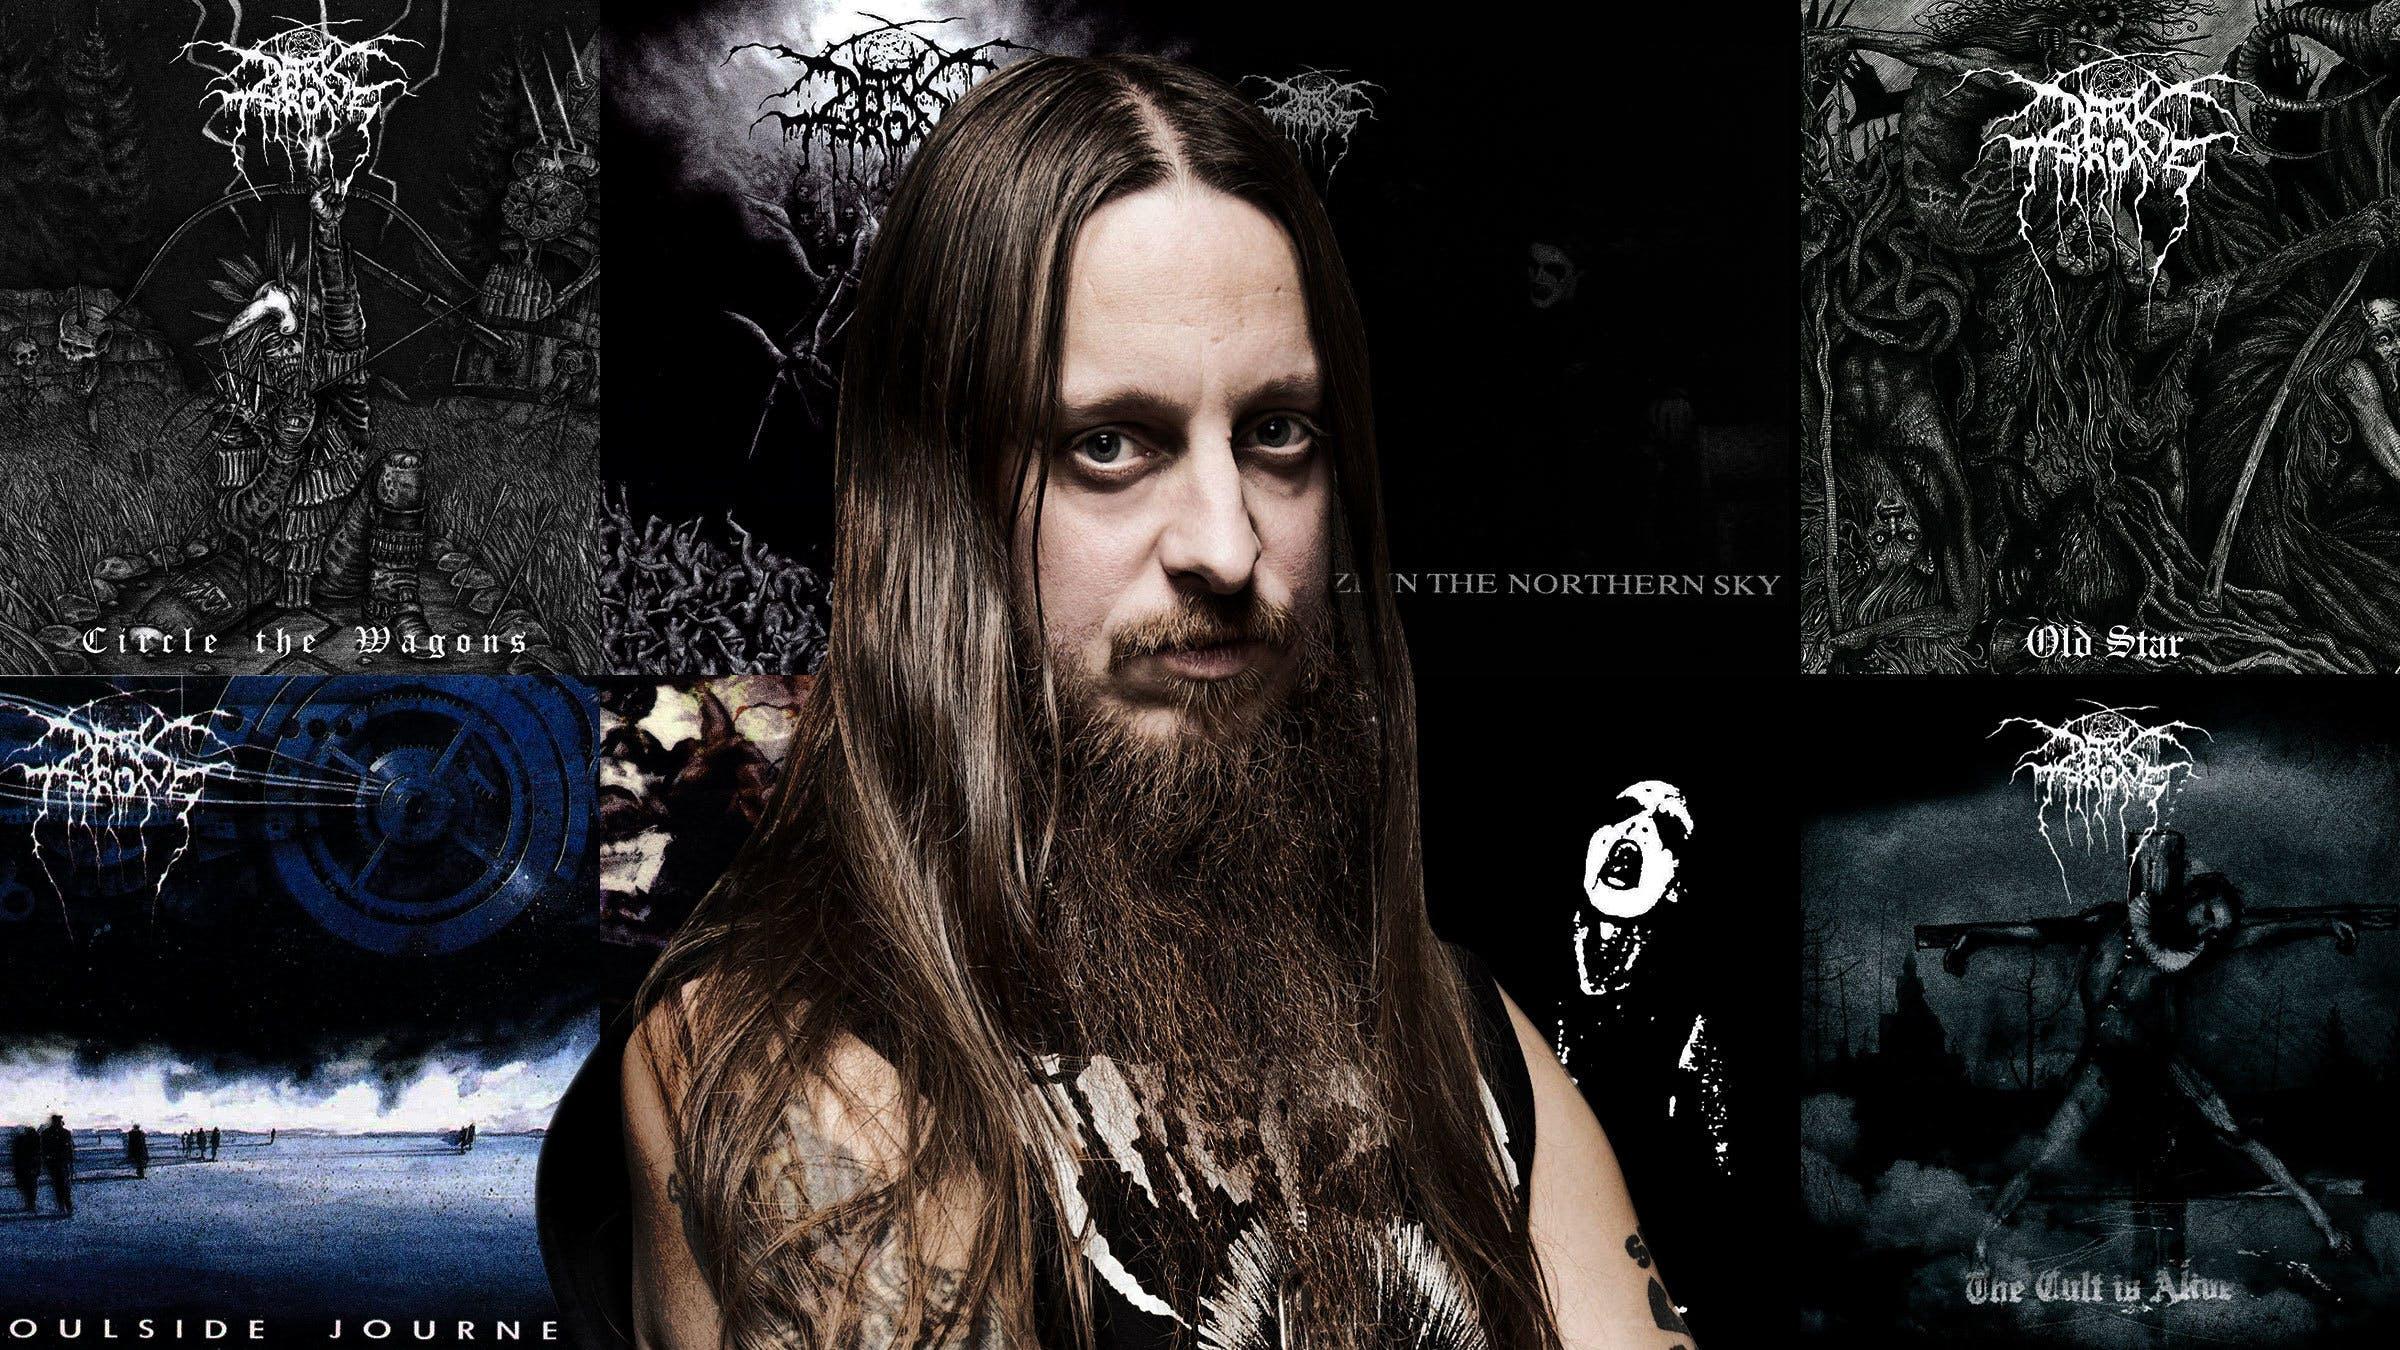 The Evolution Of Darkthrone, In The Words Of Fenriz